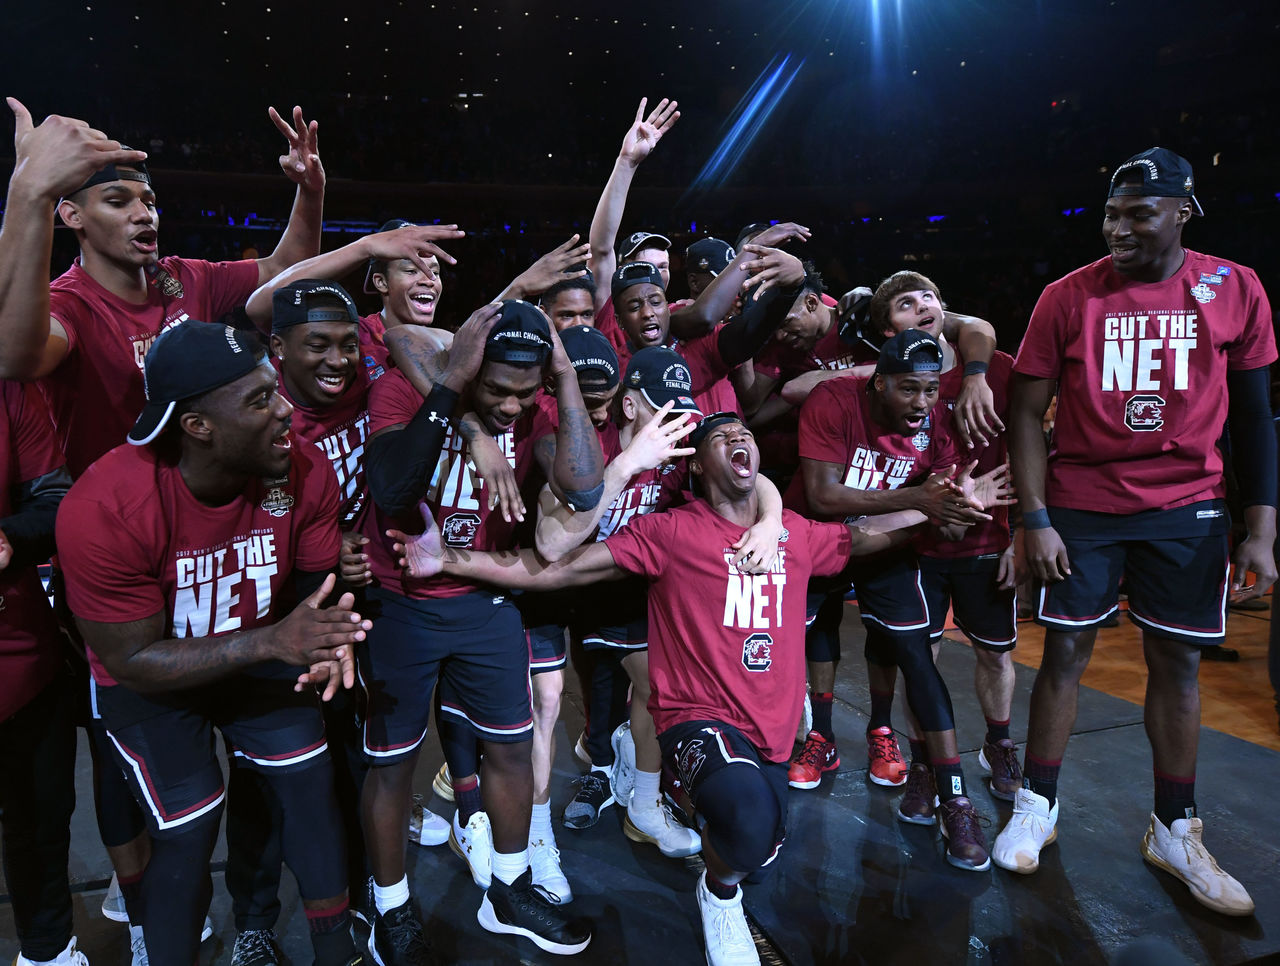 Cropped_2017-03-26t210228z_782320925_nocid_rtrmadp_3_ncaa-basketball-ncaa-tournament-east-regional-south-carolina-vs-florida